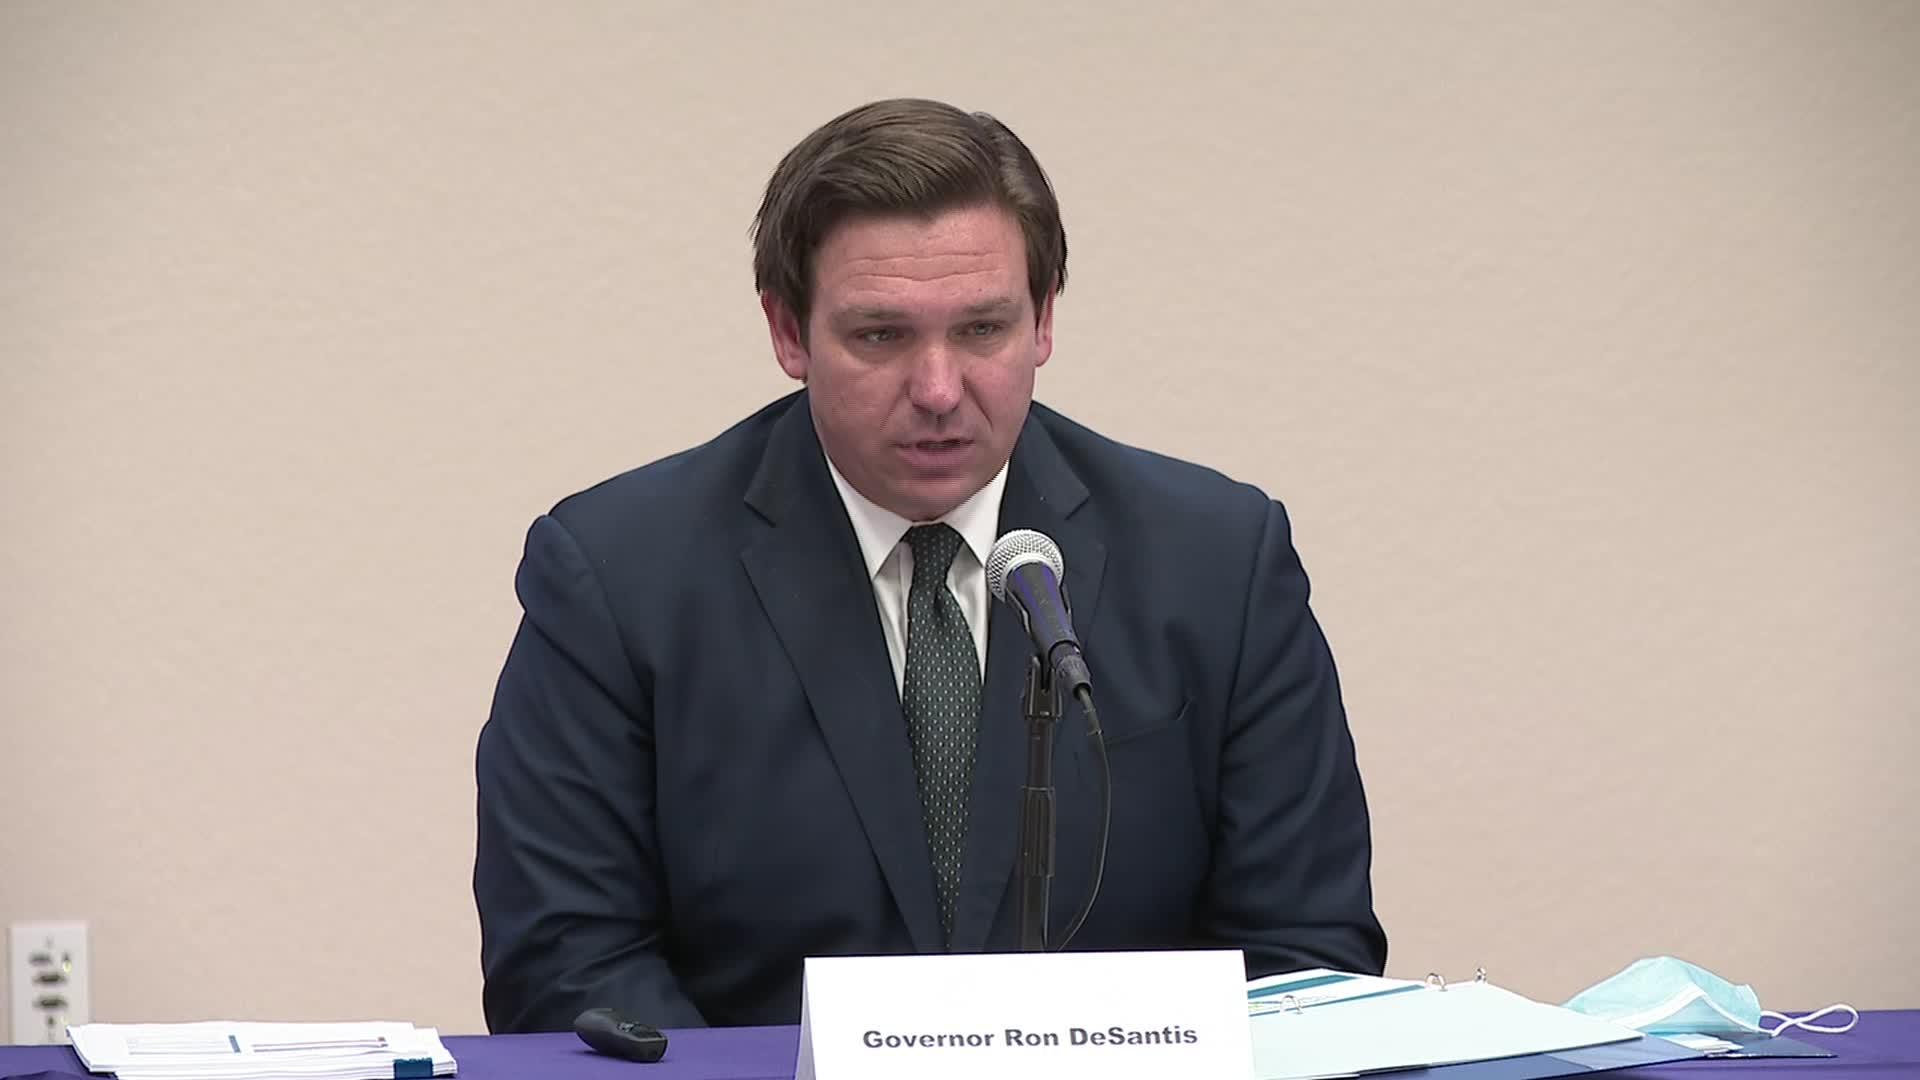 Florida Gov. Ron DeSantis speaks during a press briefing in Pensacola, Florida, on Sunday.